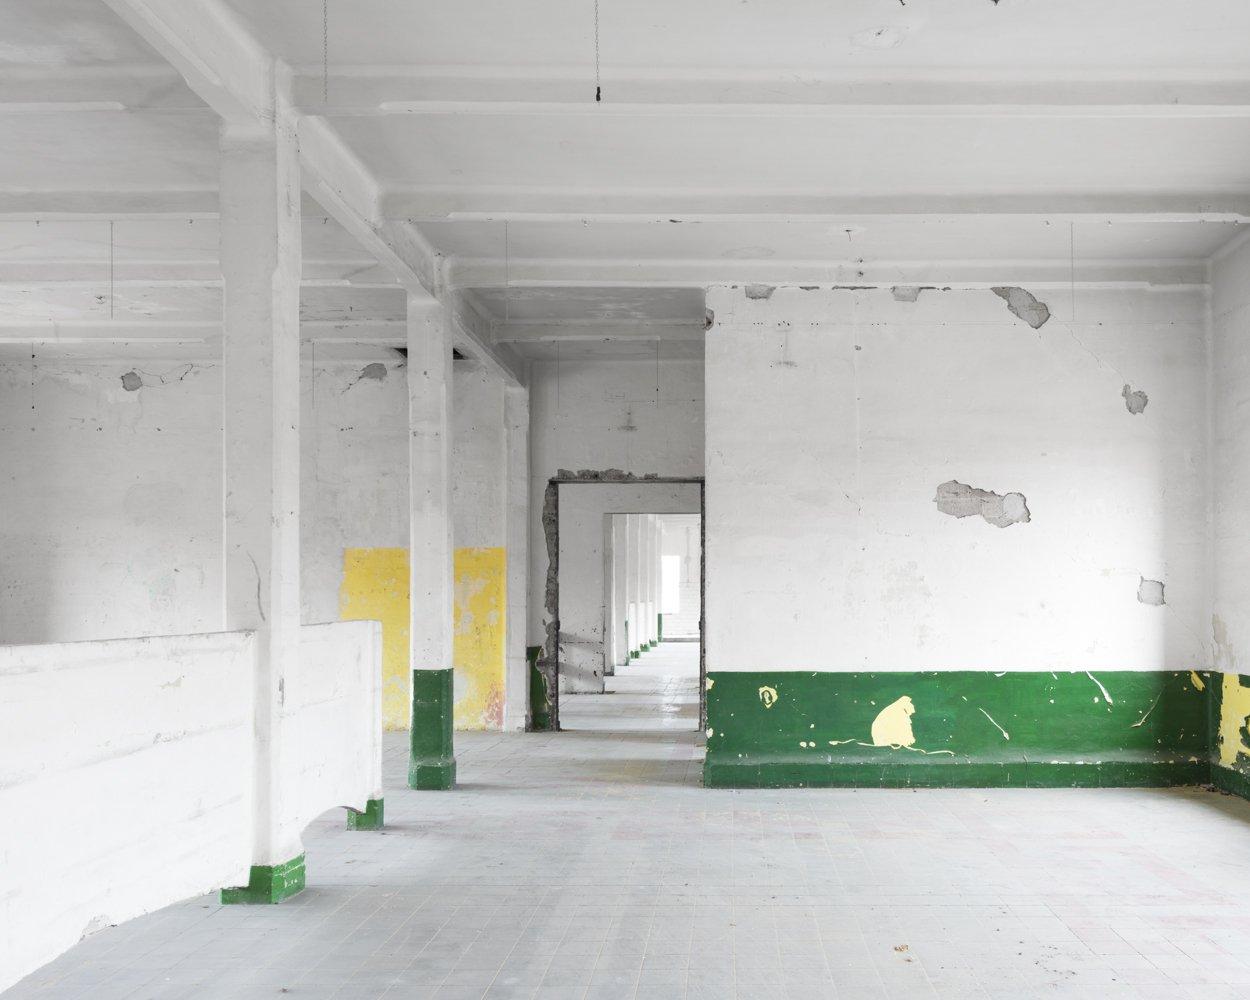 gary - EMPTINESS - cesar azcarate fotografia, galerias, emptiness